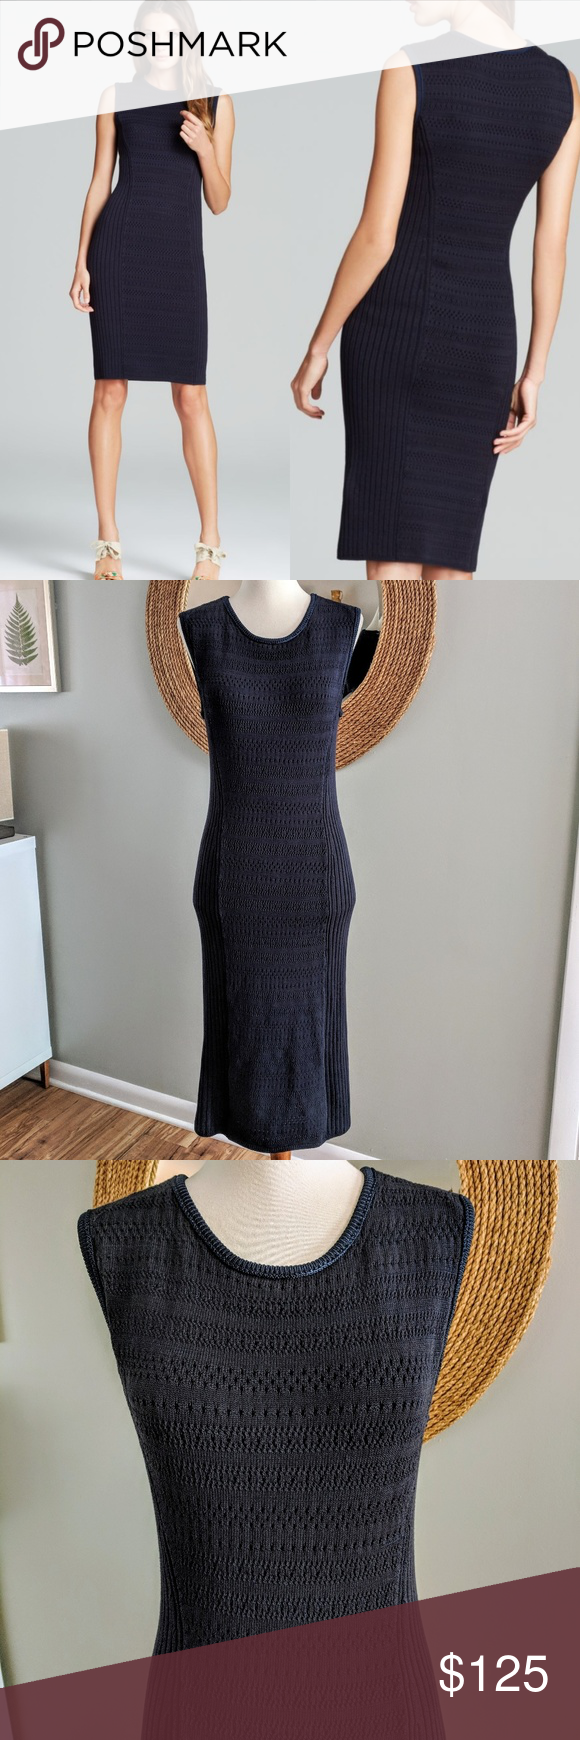 4359f408a19 Tory Burch Penelope Sleeveless Sweater Dress Navy blue body hugging  pointelle and ribbed knit dress. Mesh like lining.  Cotton rayon nylon spandex.